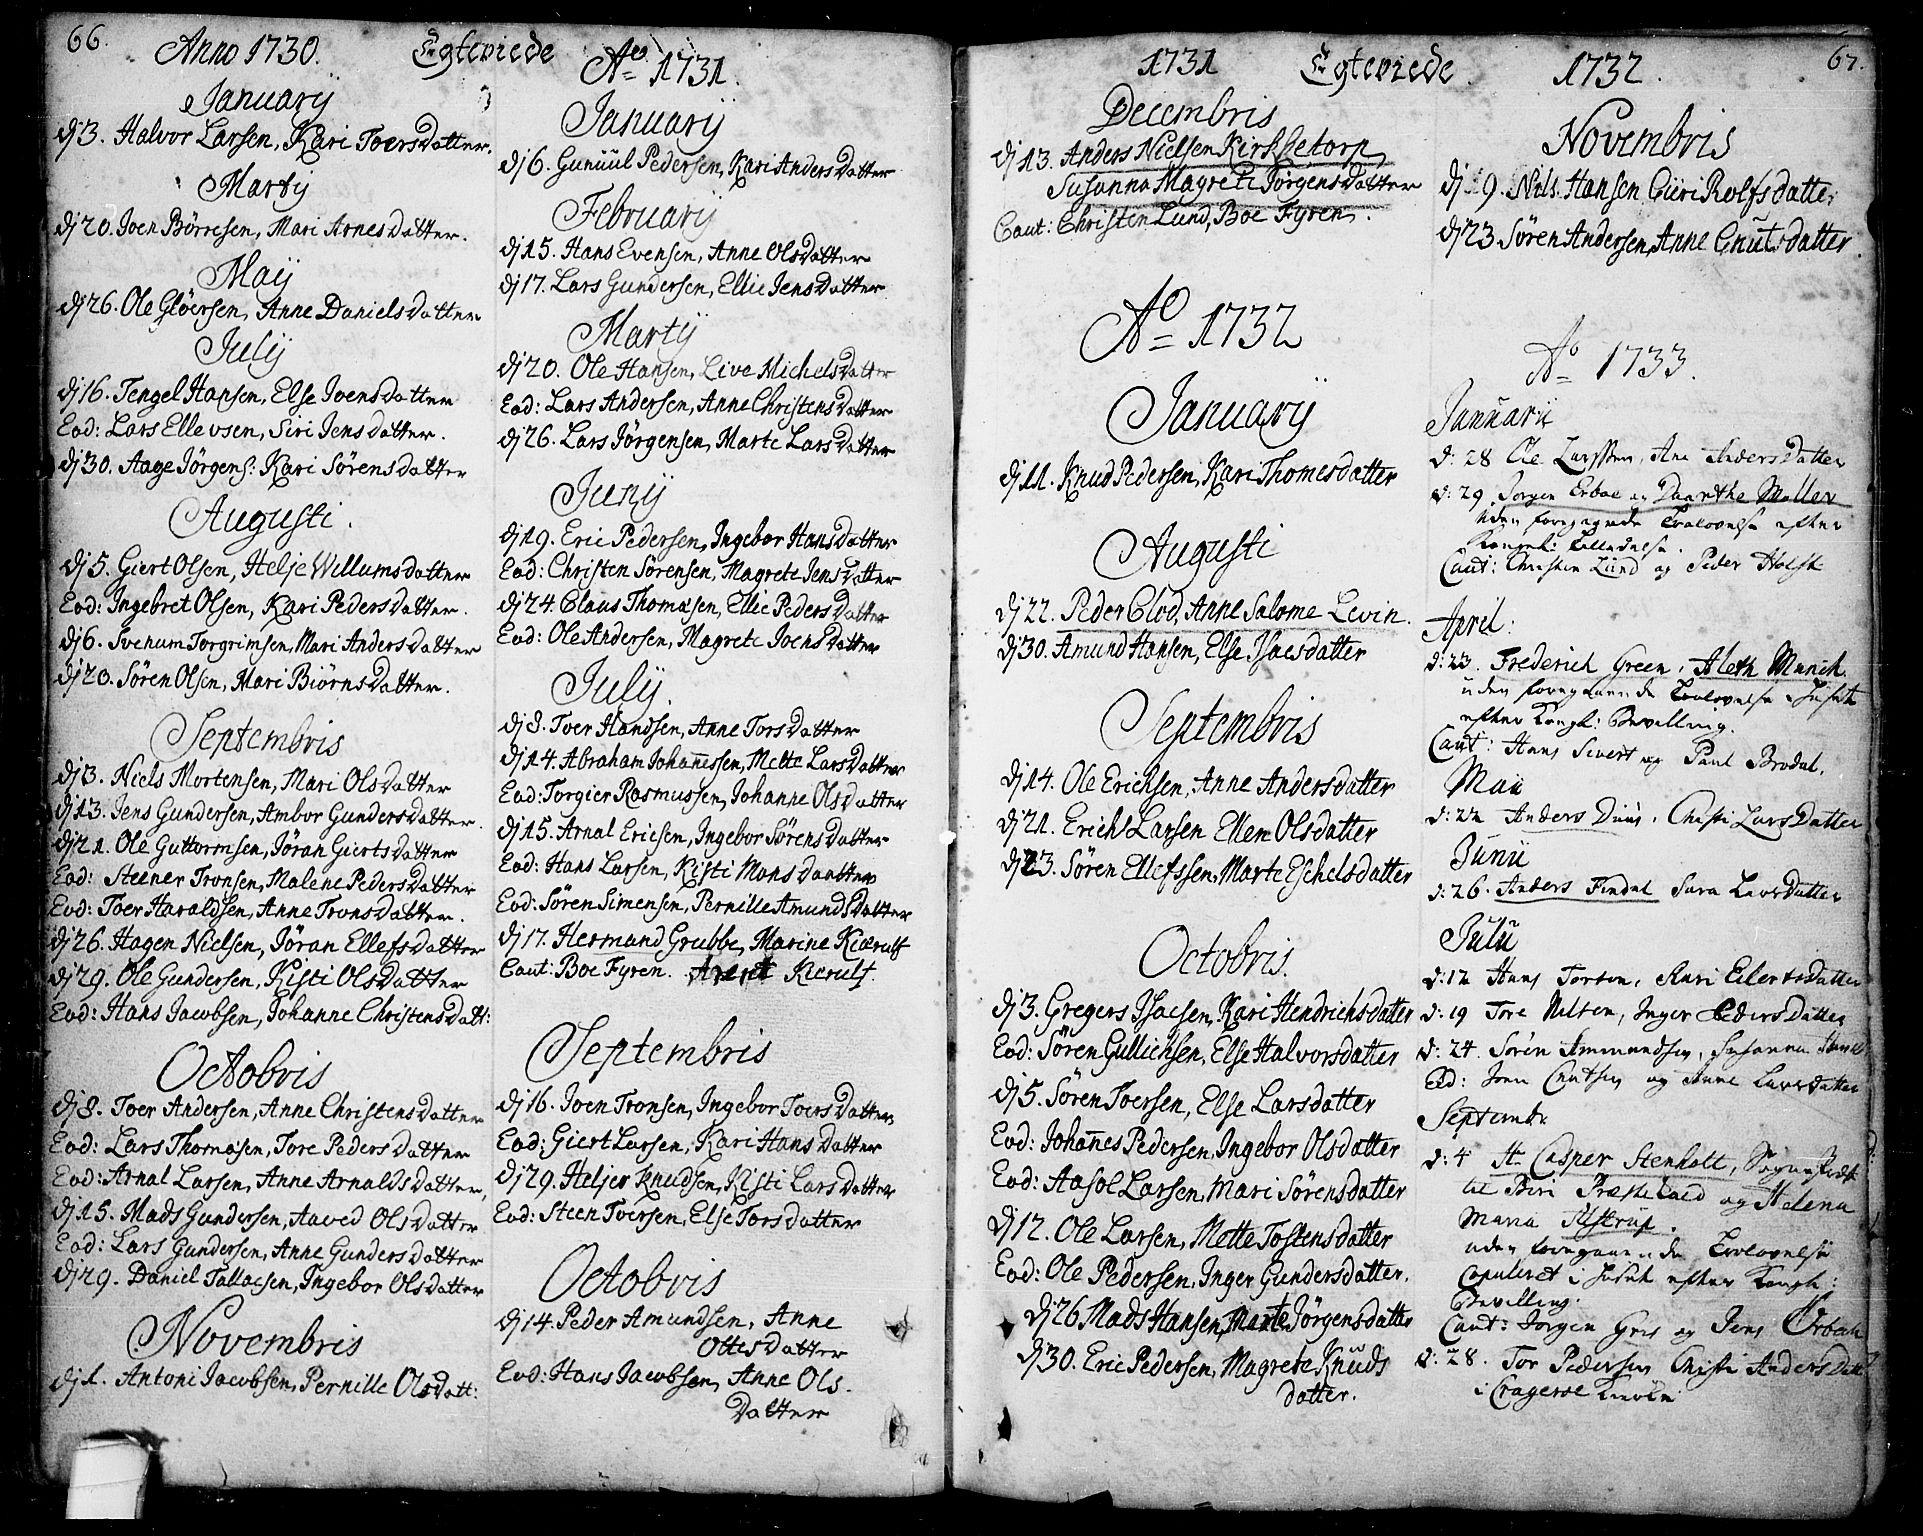 SAKO, Bamble kirkebøker, F/Fa/L0001: Ministerialbok nr. I 1, 1702-1774, s. 66-67